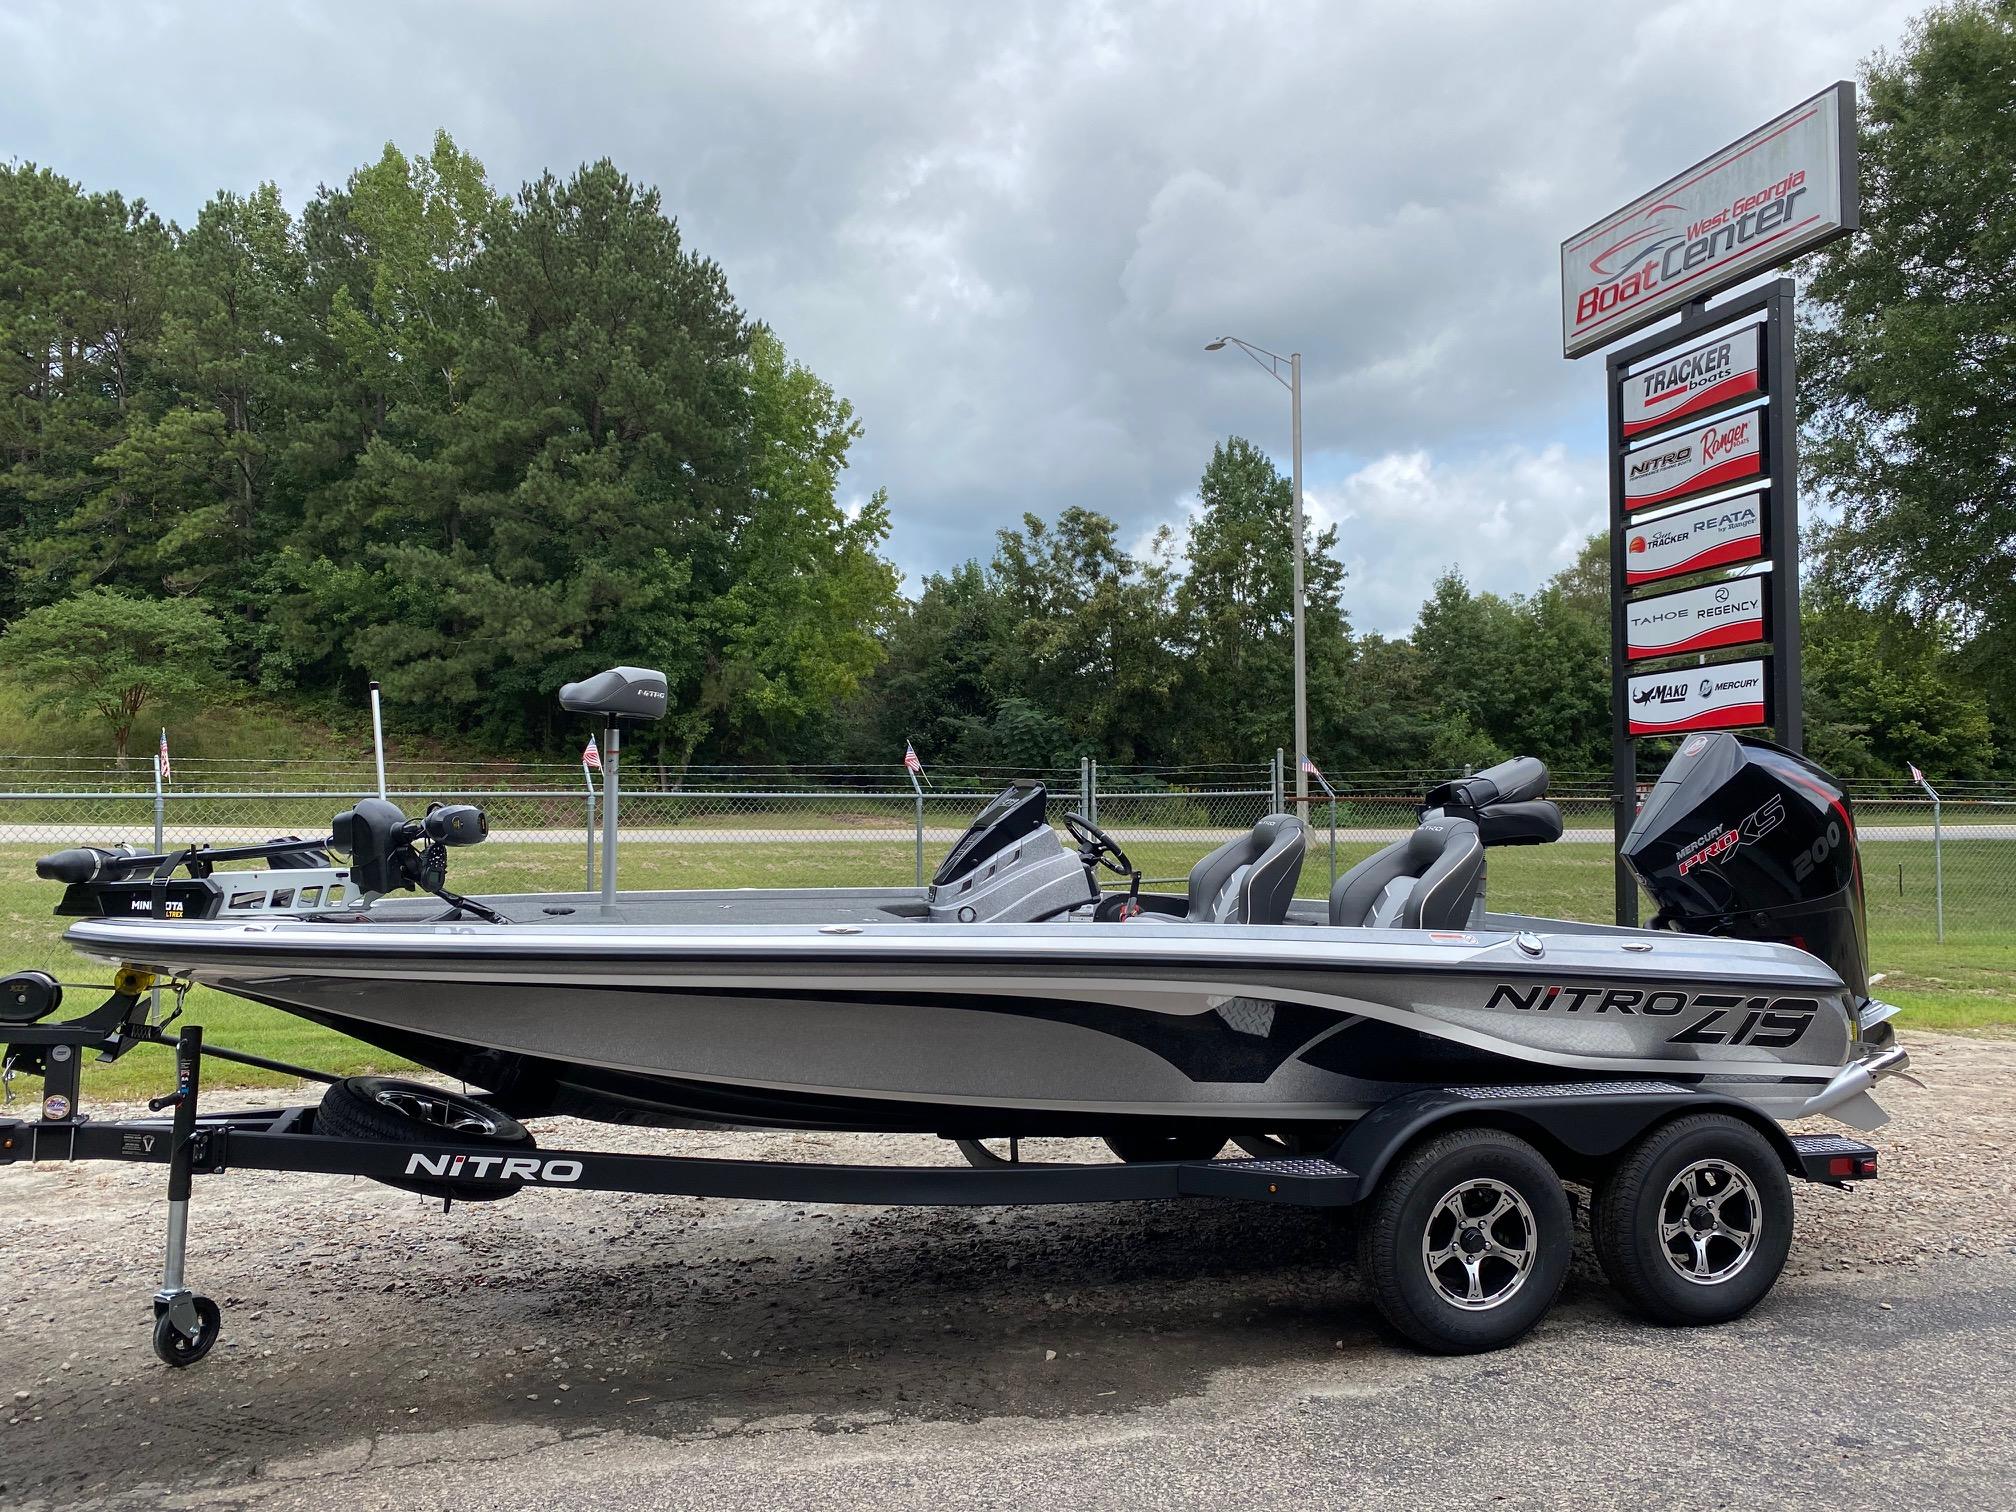 2021 Nitro boat for sale, model of the boat is Z19 w/200L PXS4 & Image # 15 of 50